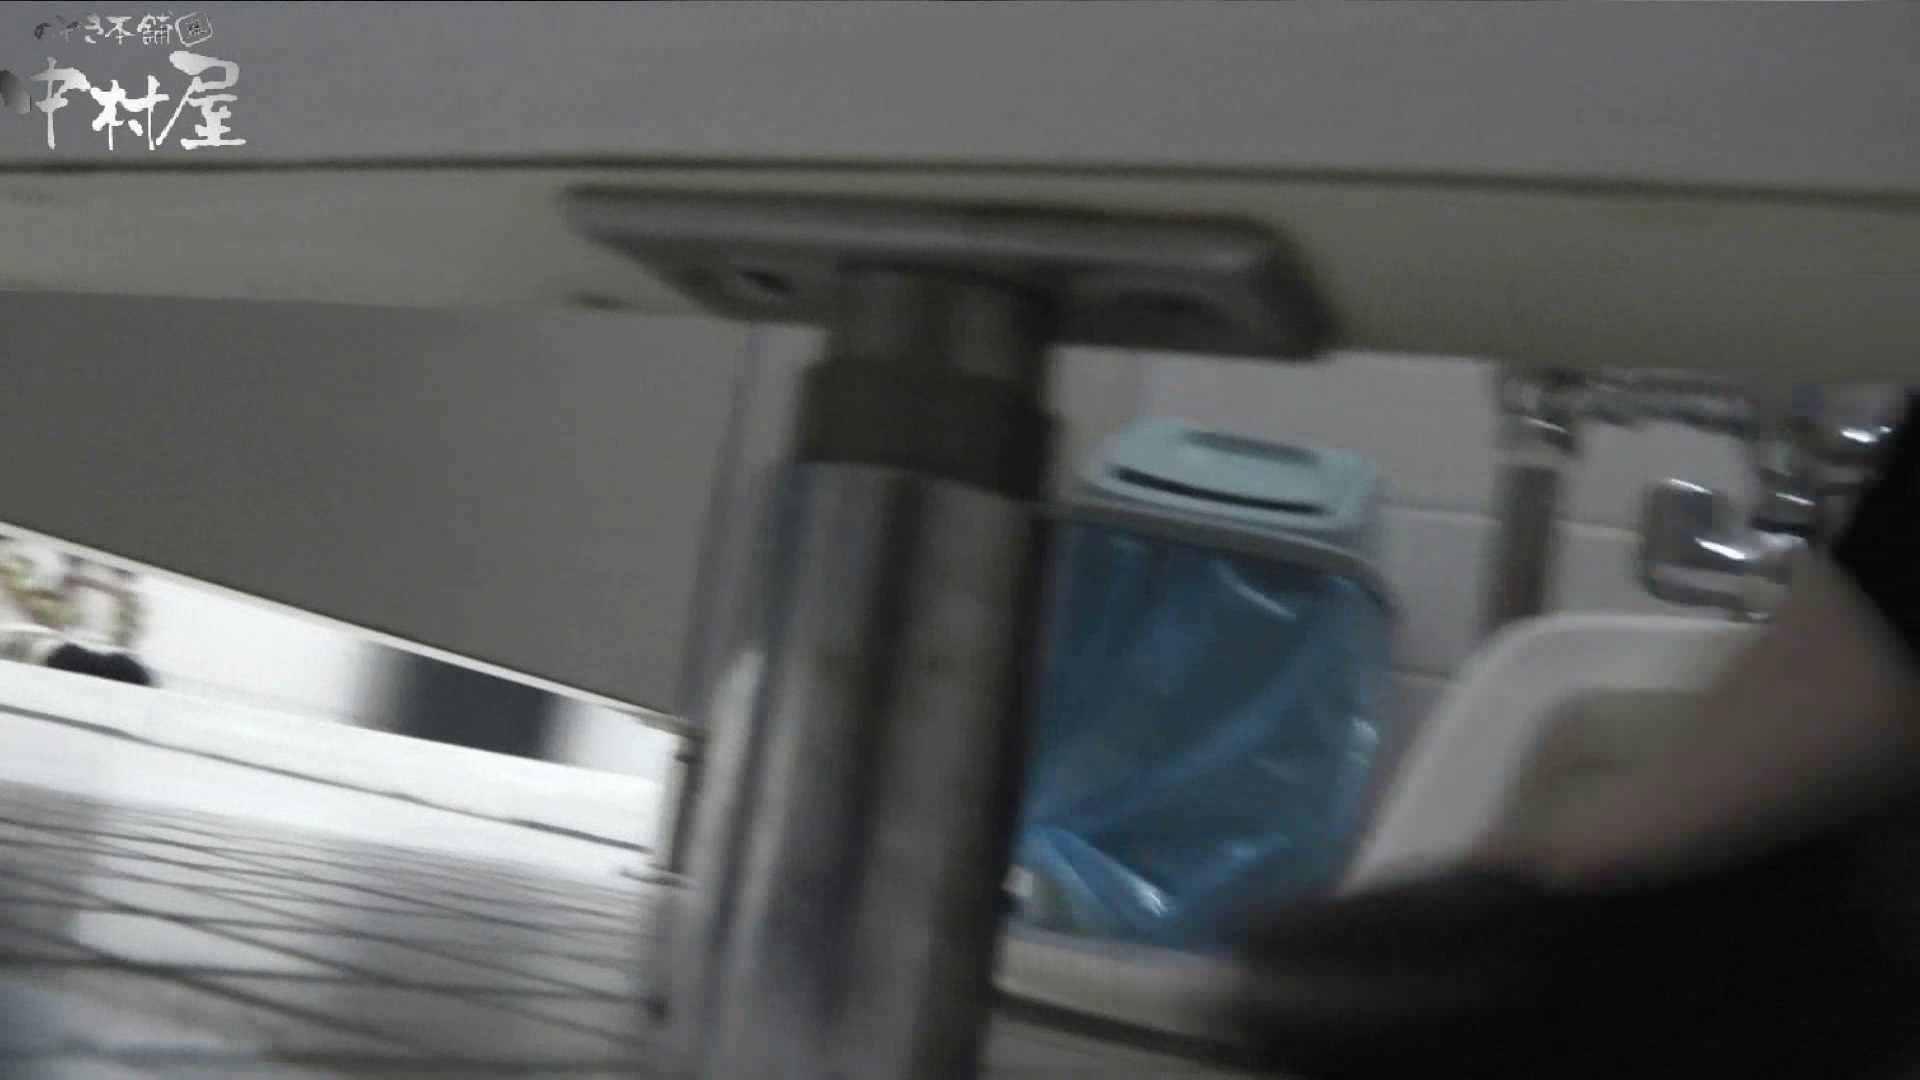 vol.34 命がけ潜伏洗面所! アソコの毛が長髪な件 後編 潜入 オメコ無修正動画無料 108枚